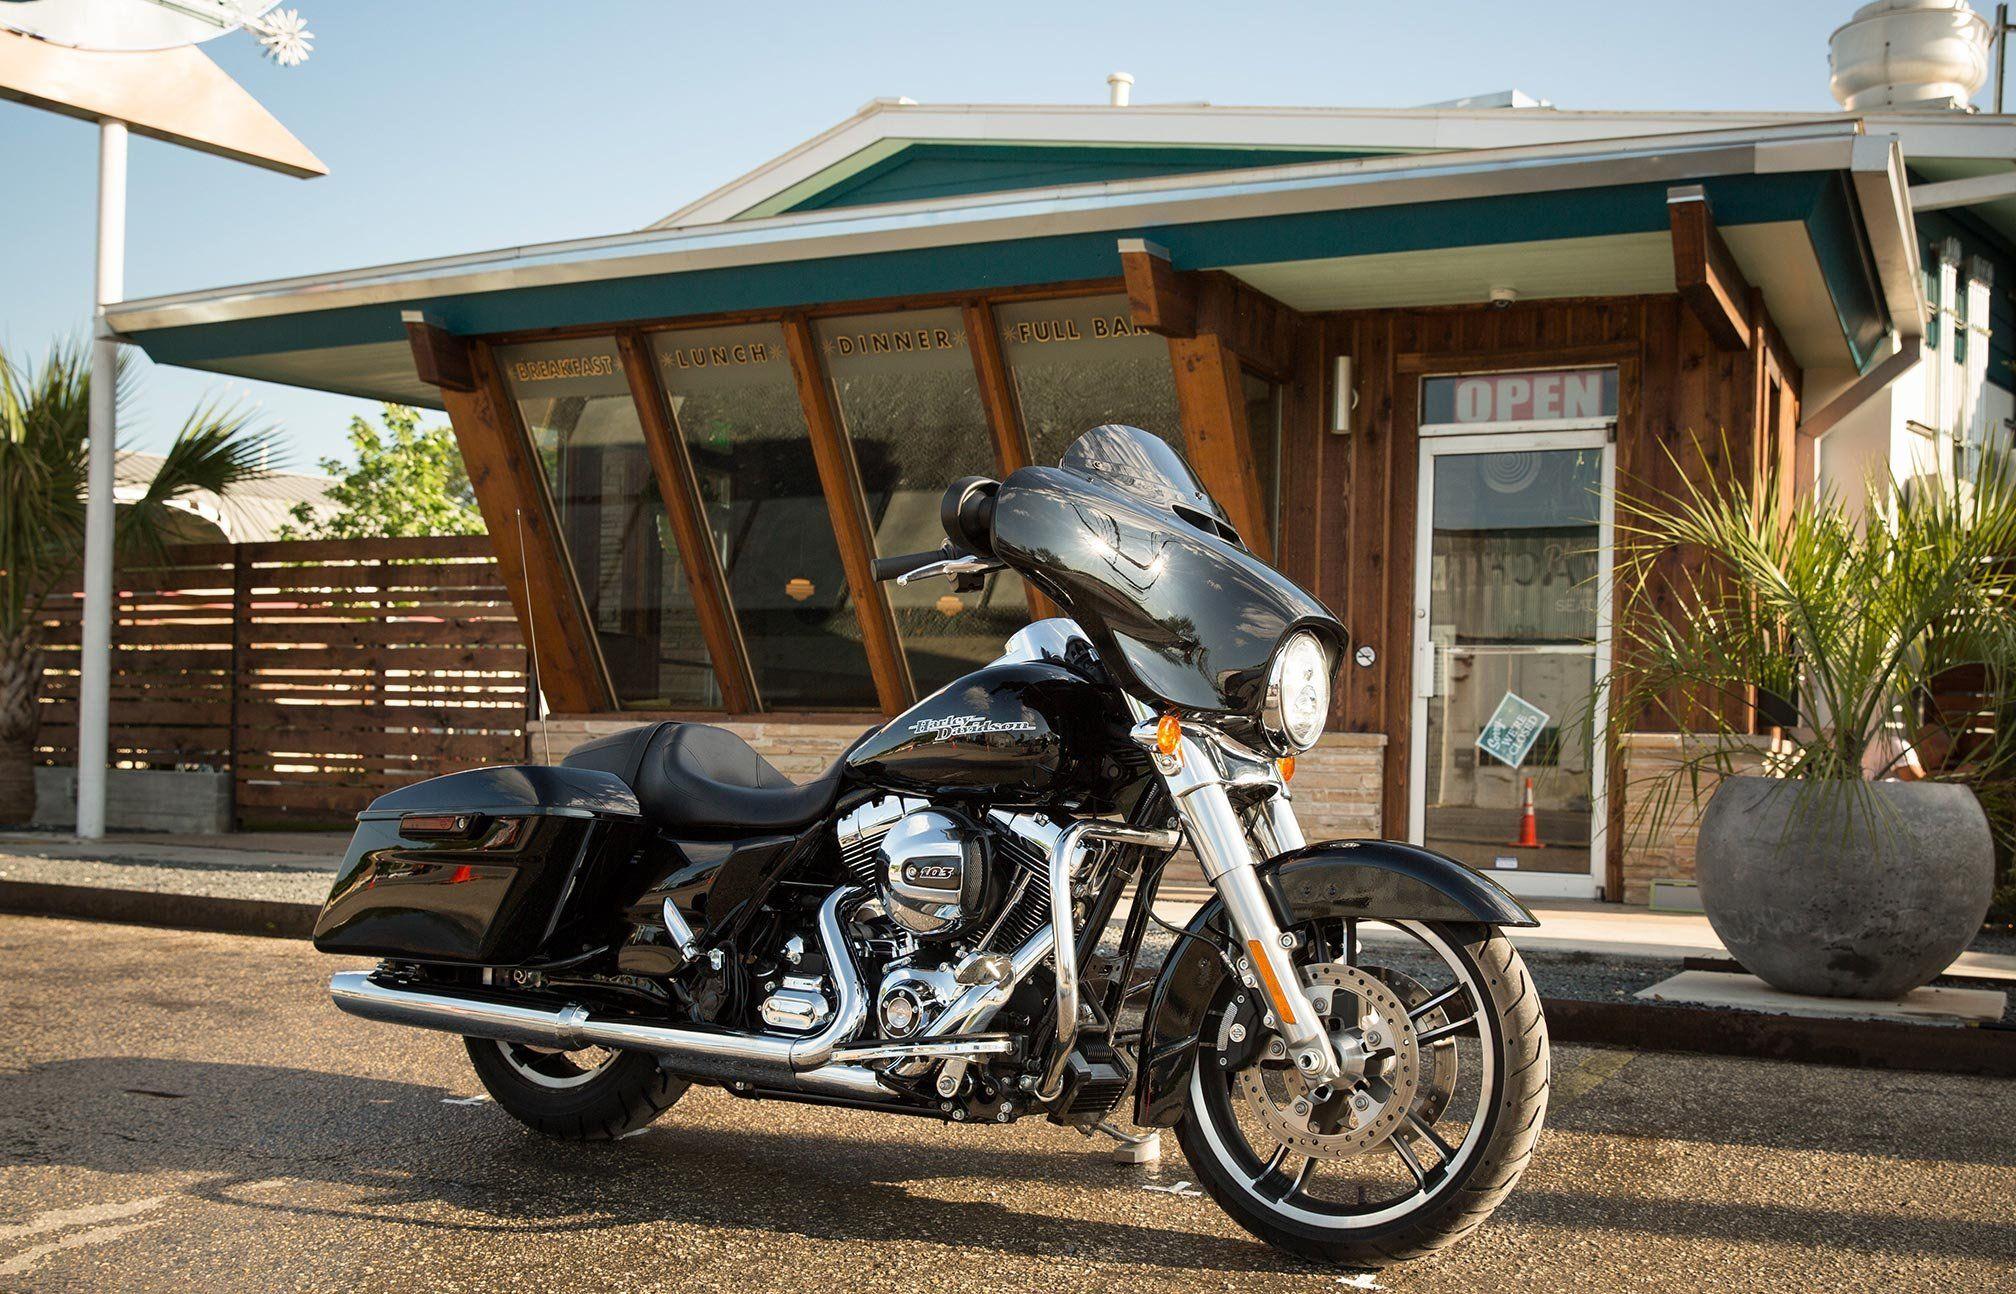 Harley Davidson Street Glide Wallpapers